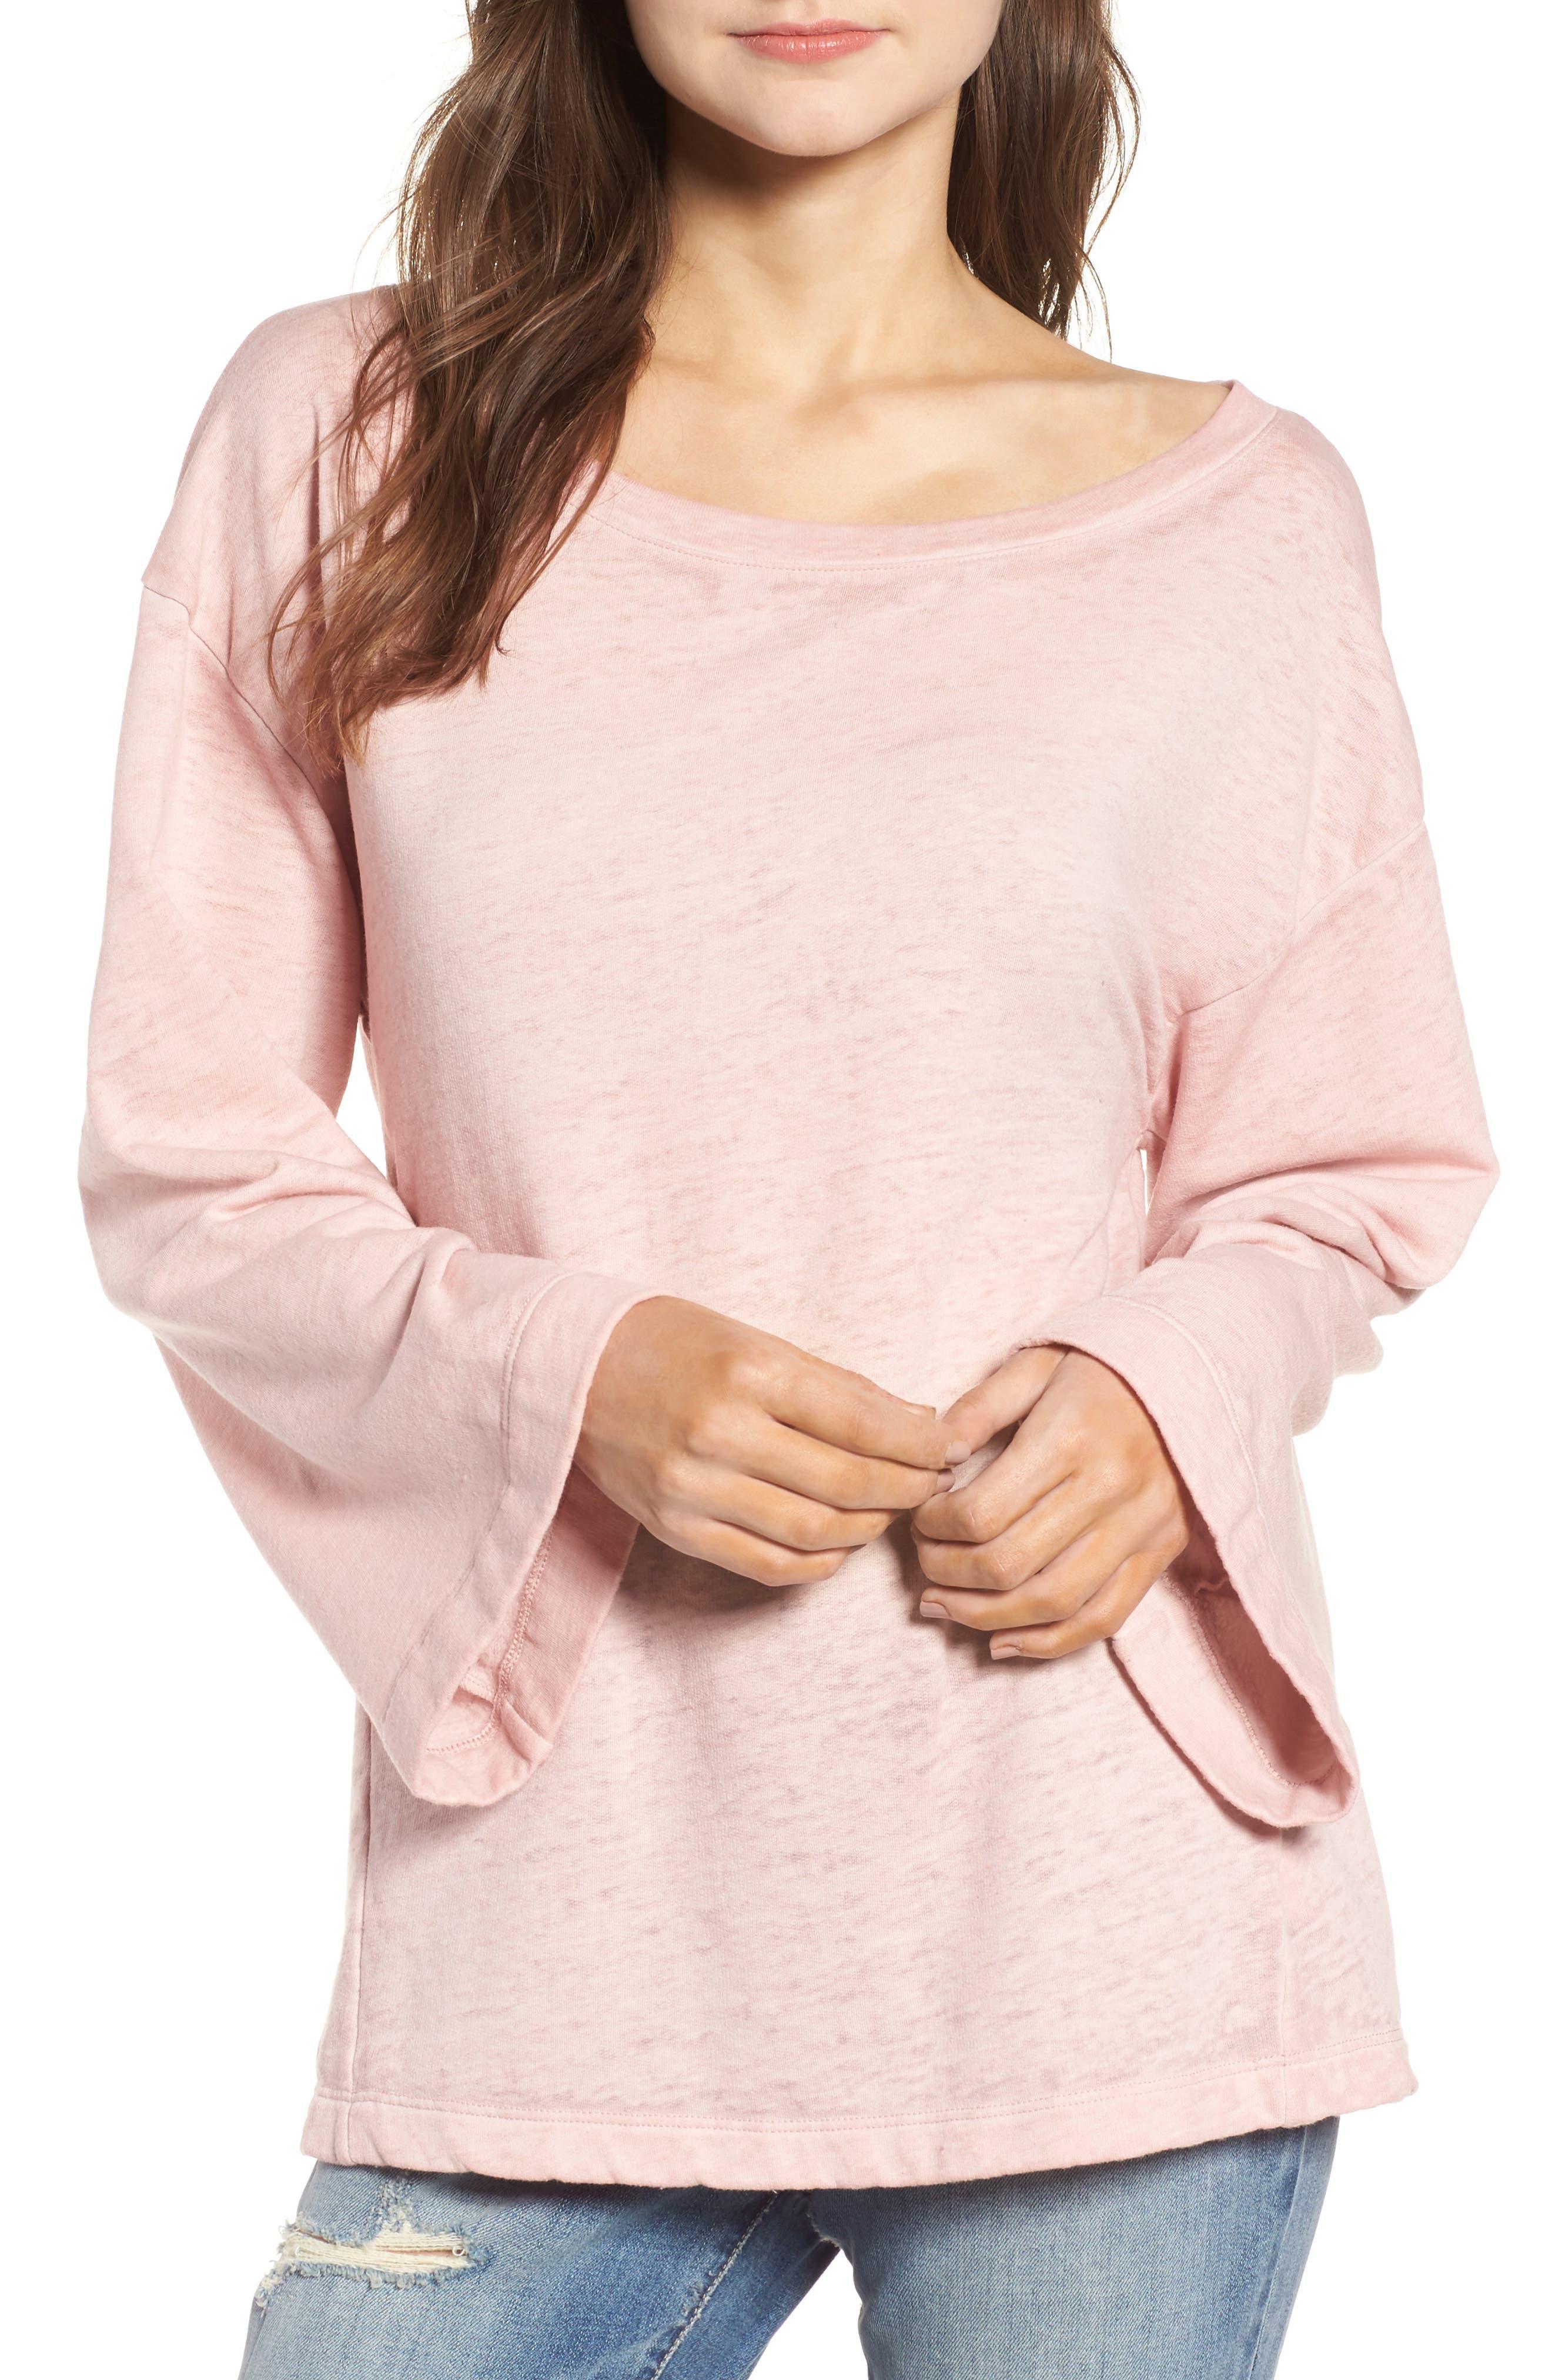 Bell Sleeve Sweatshirt,                             Main thumbnail 1, color,                             Pink Silver